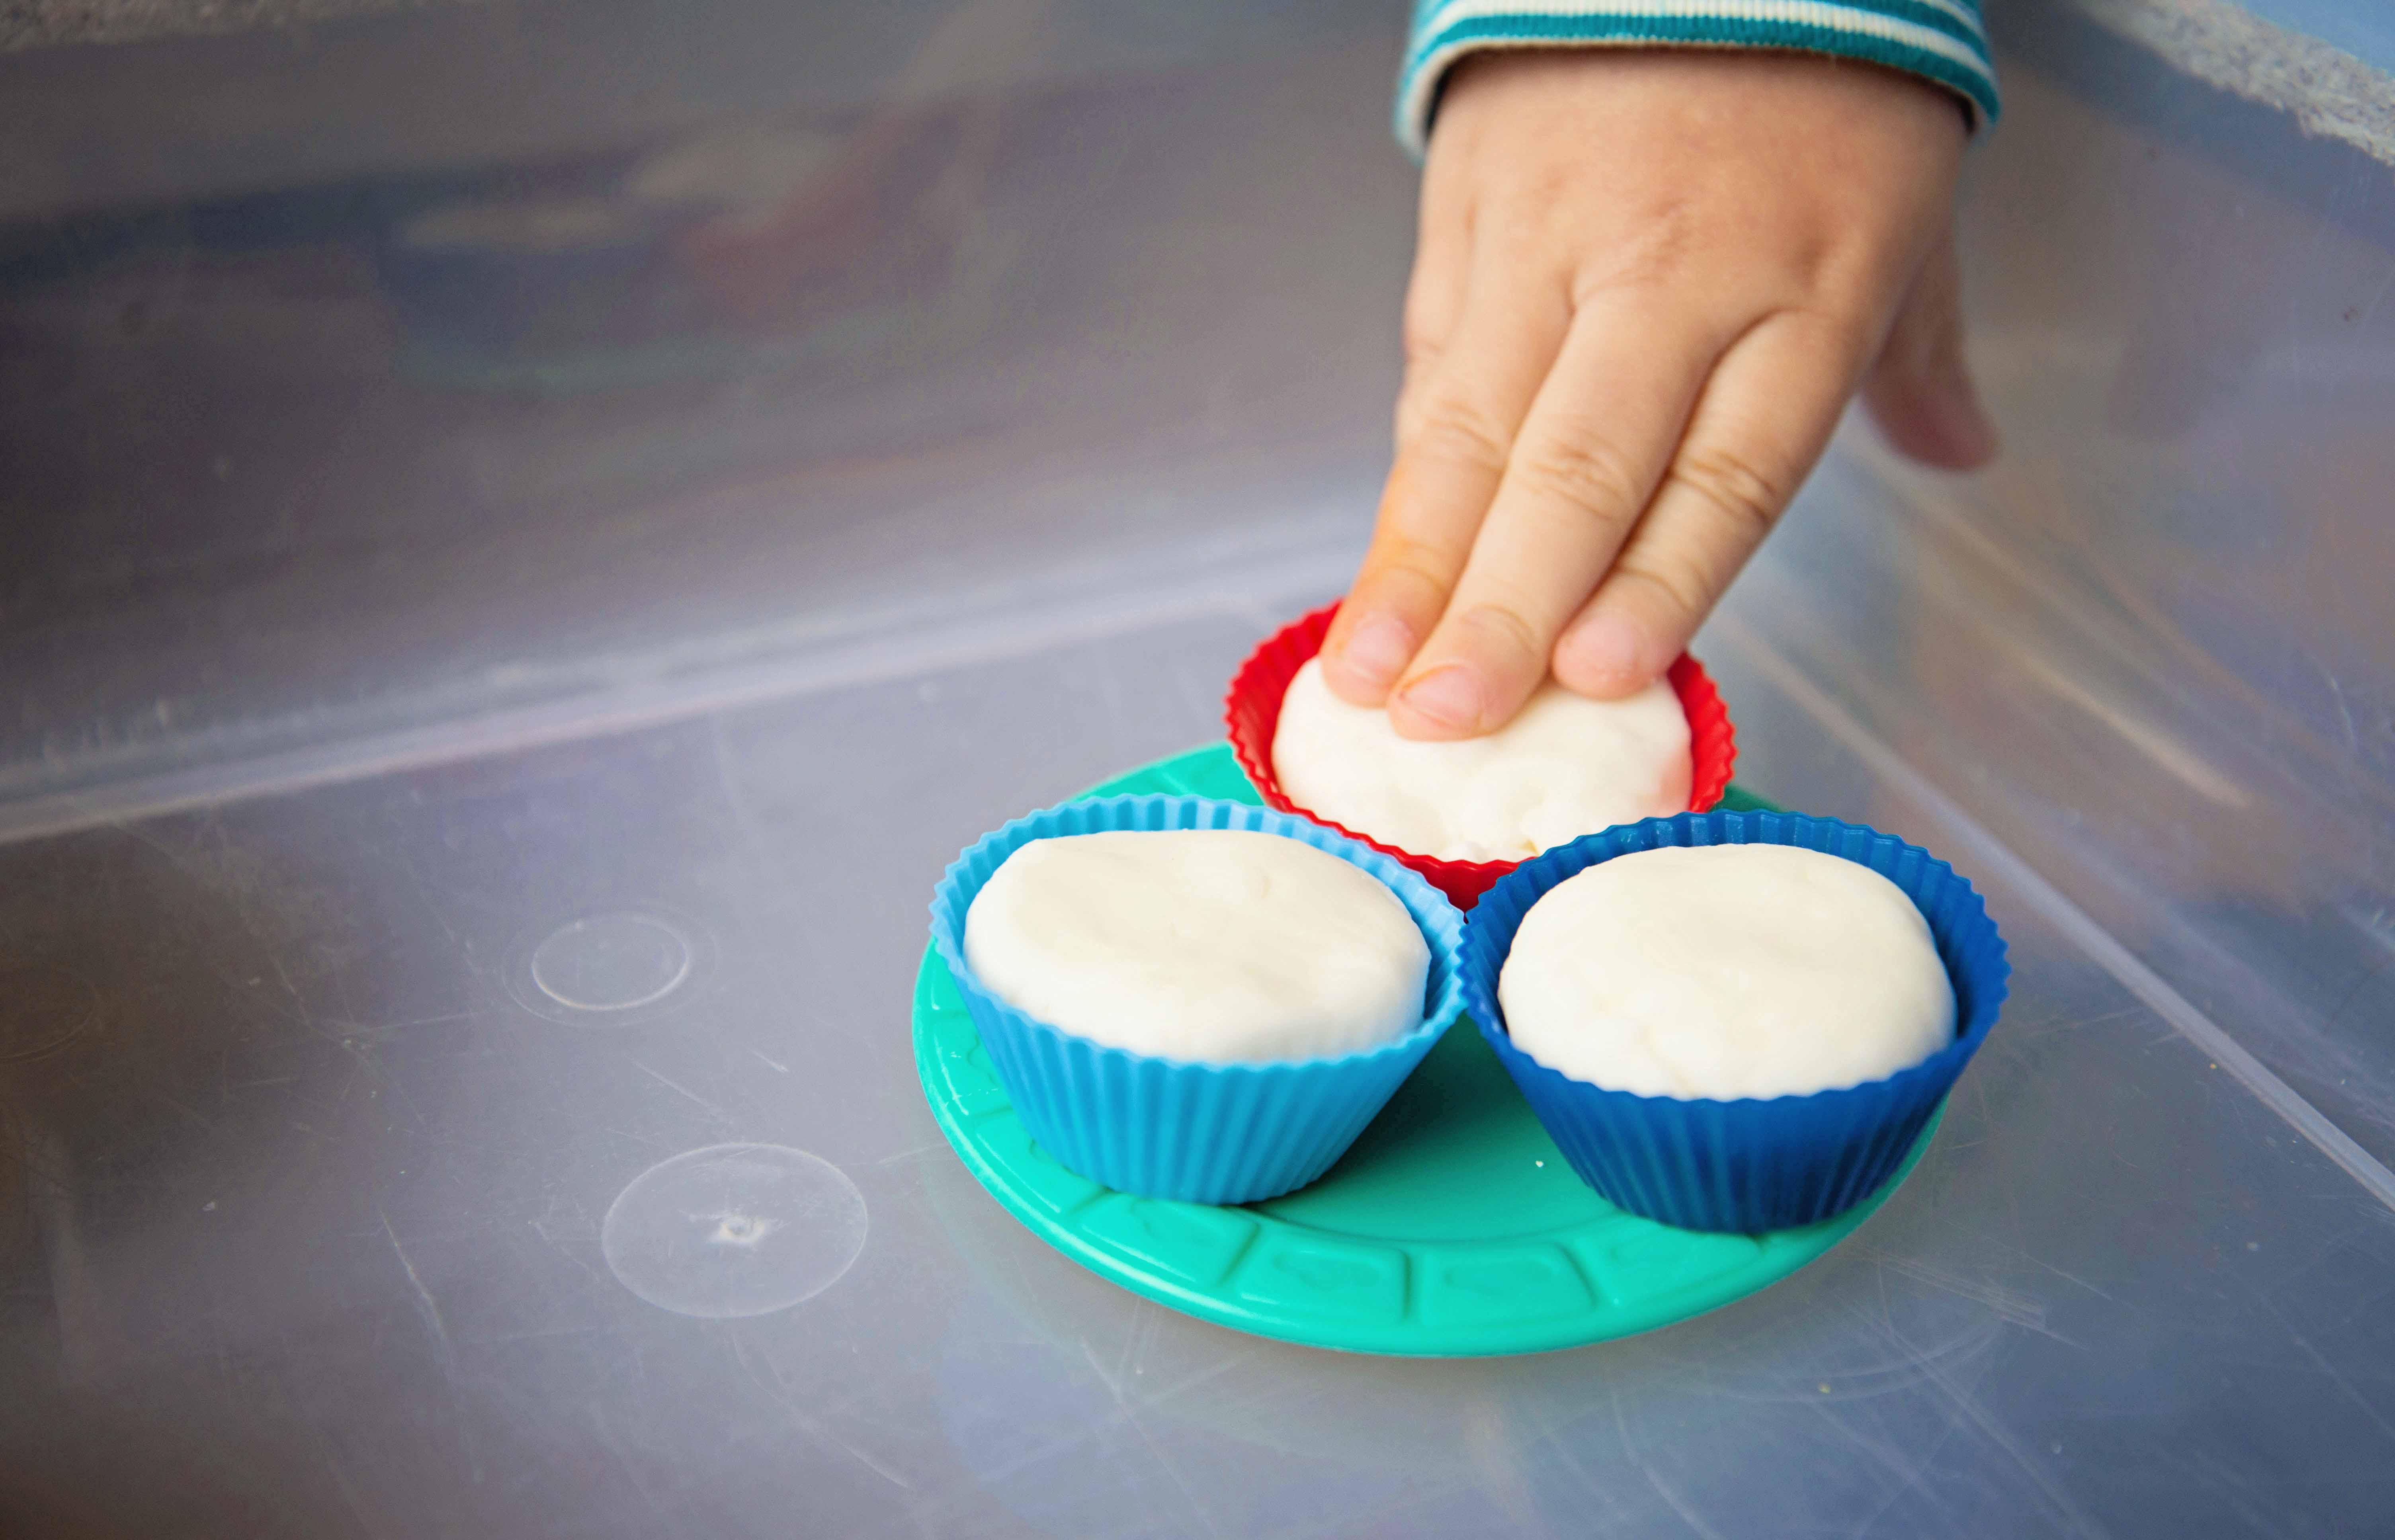 Babes in Deutschland, Cupcake bake shop sensory bin